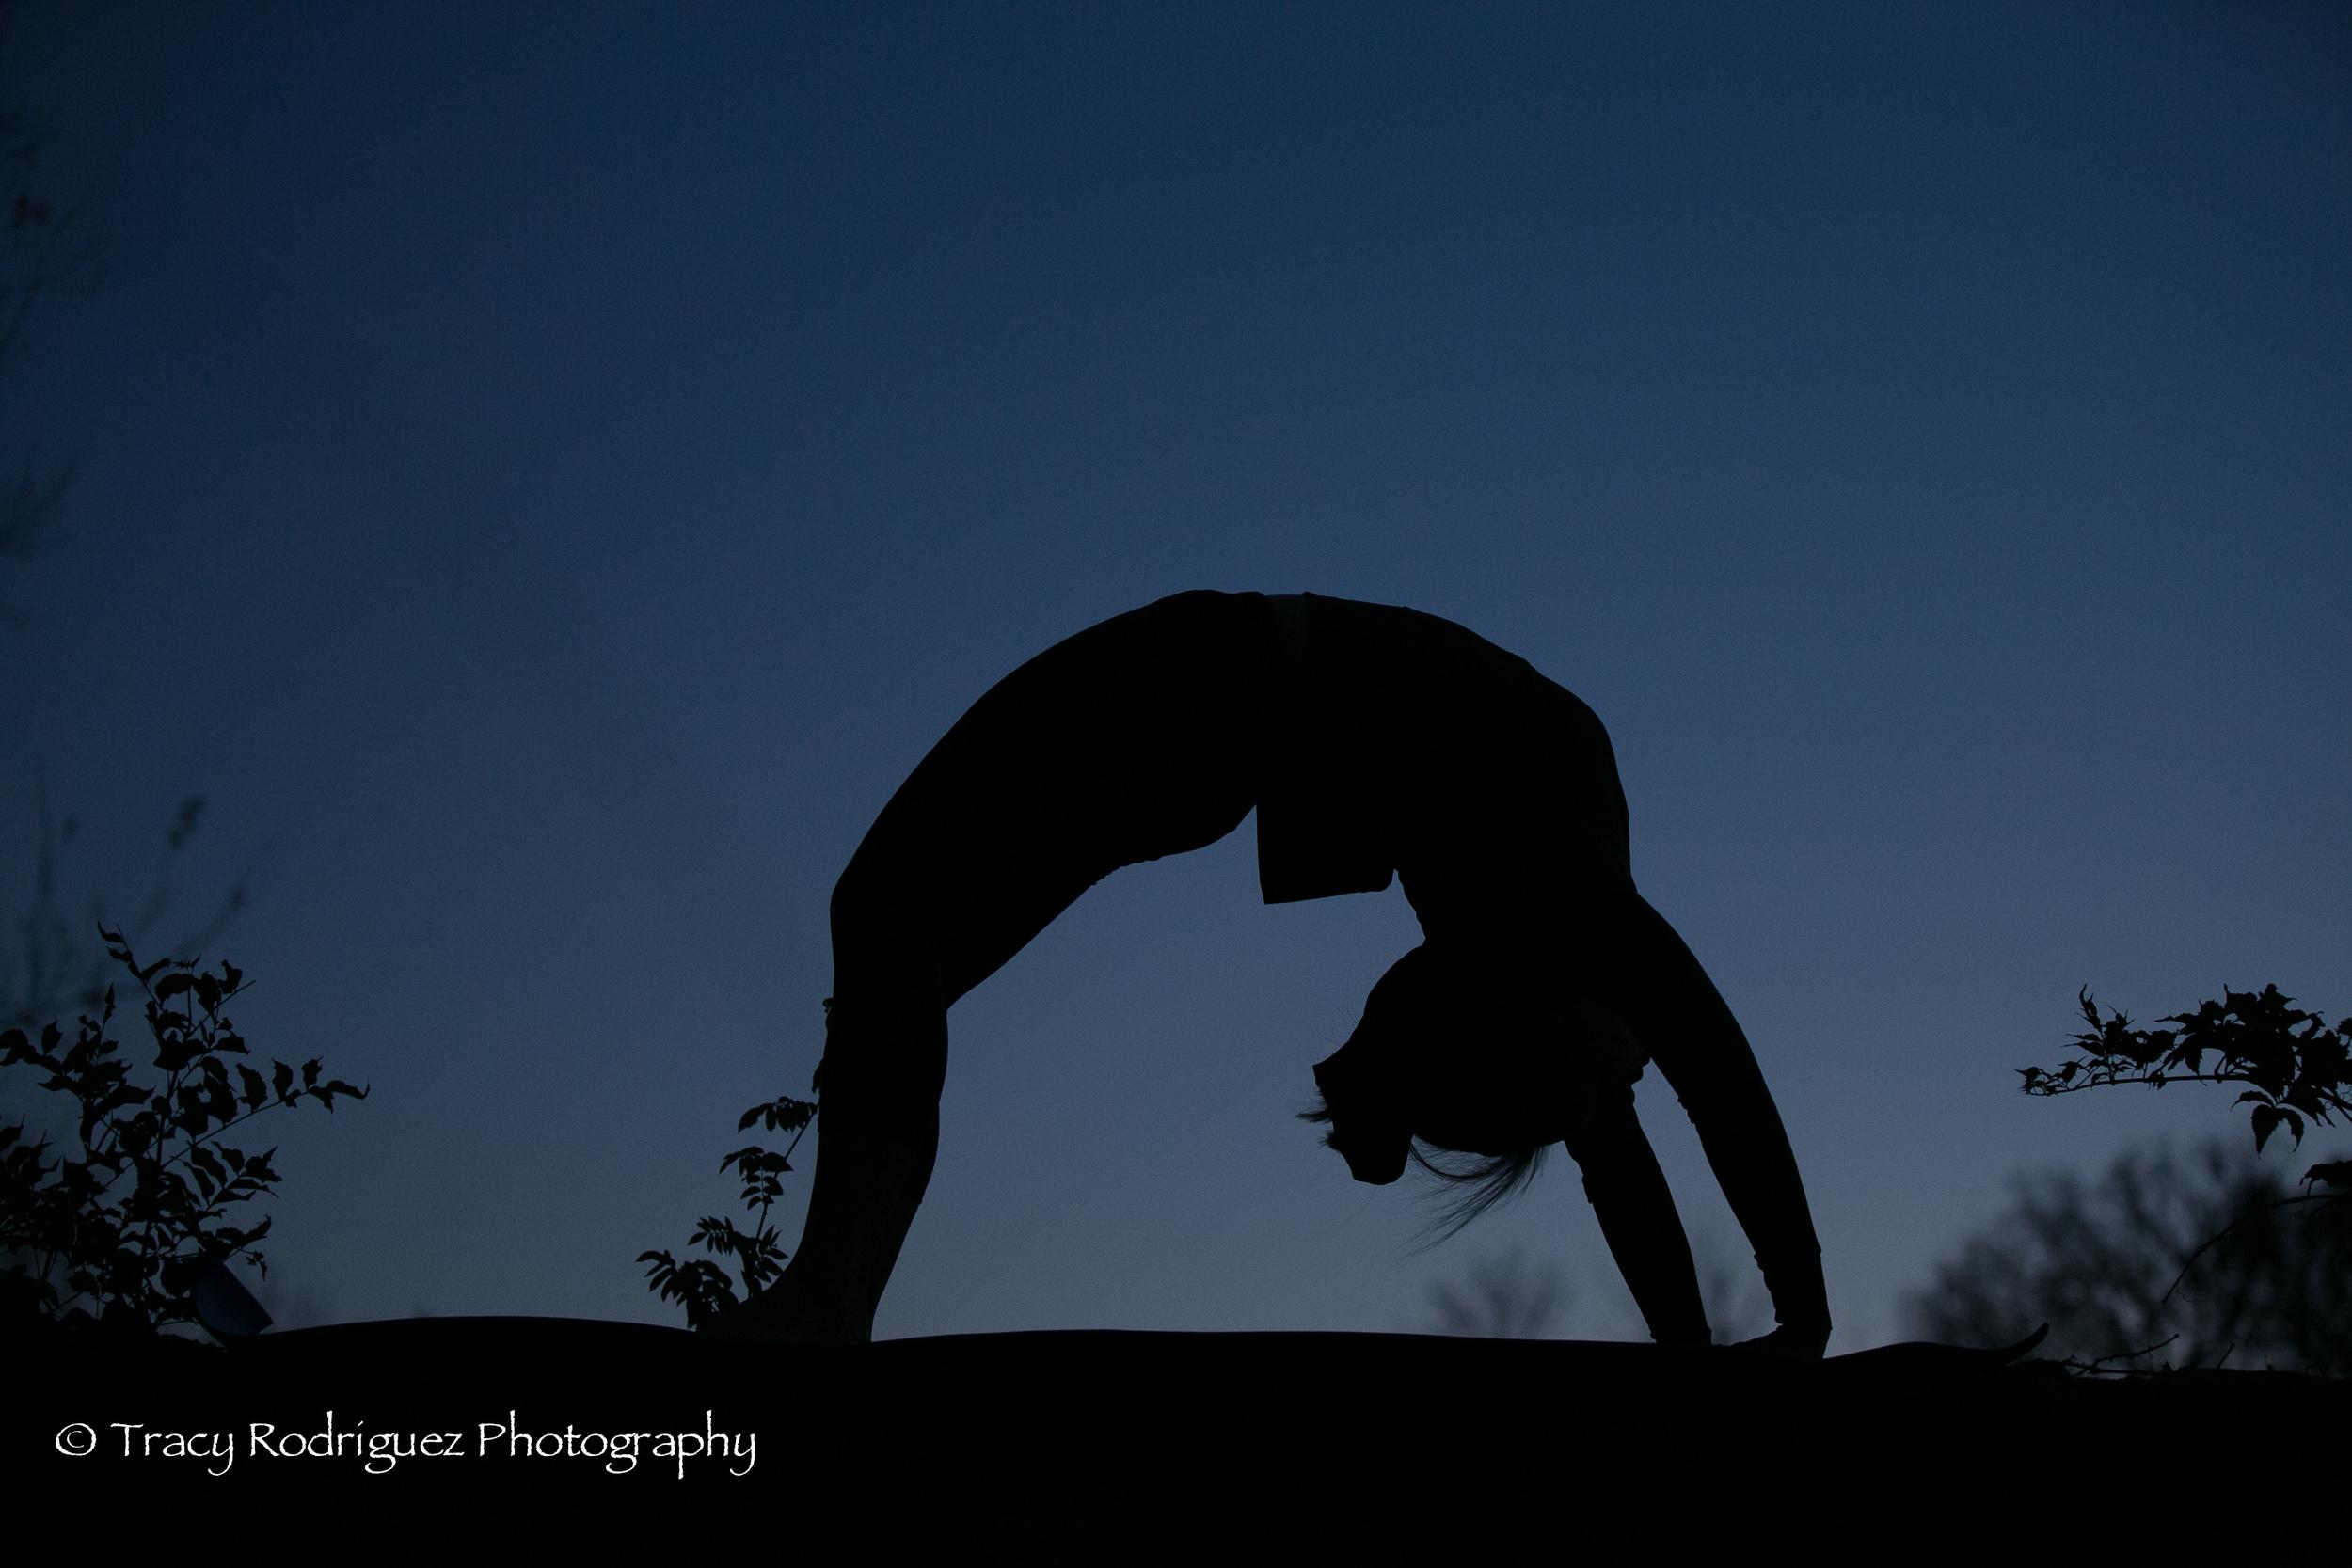 Tracy_Rodriguez_Photography_Blog-5584.jpg